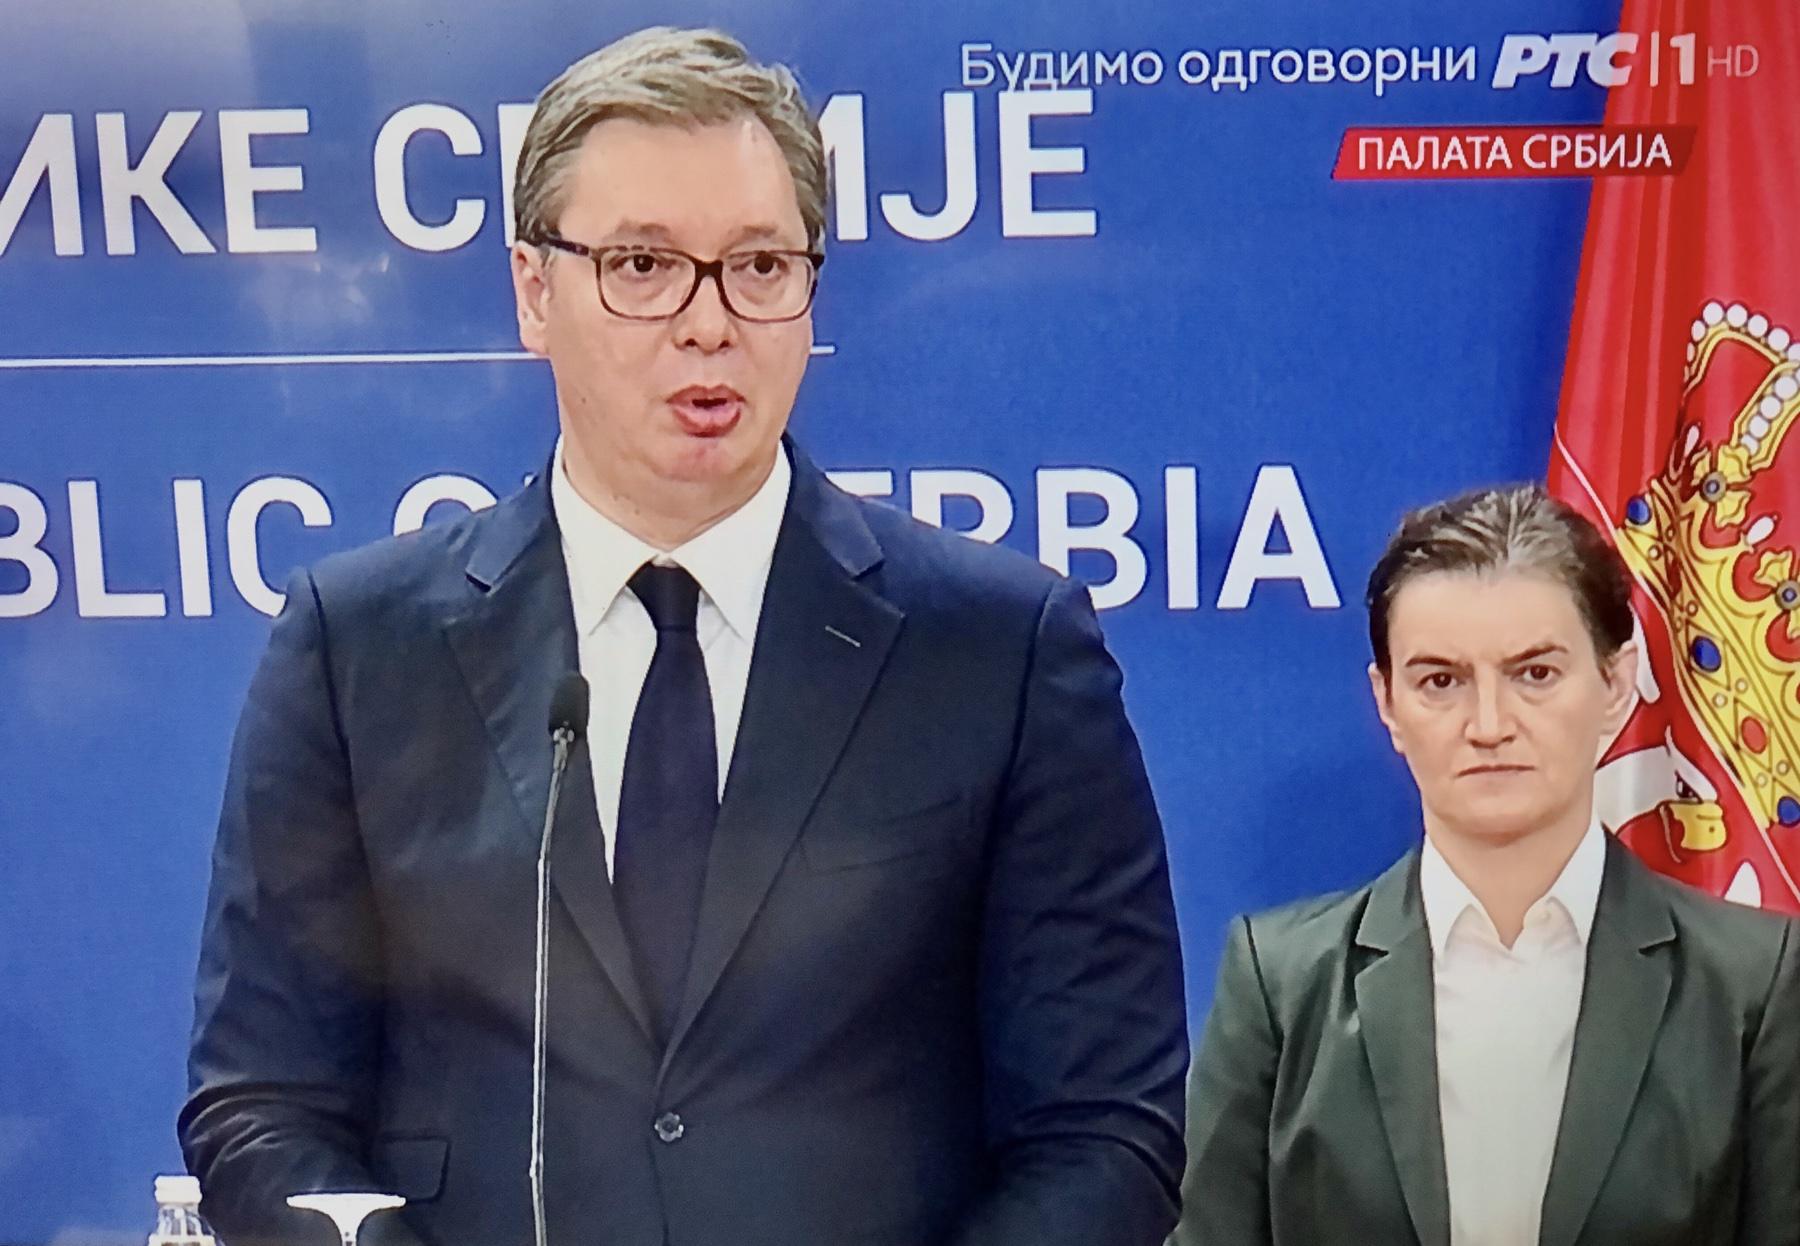 Александар Вучић и Ана Брнабић, фото: РТС